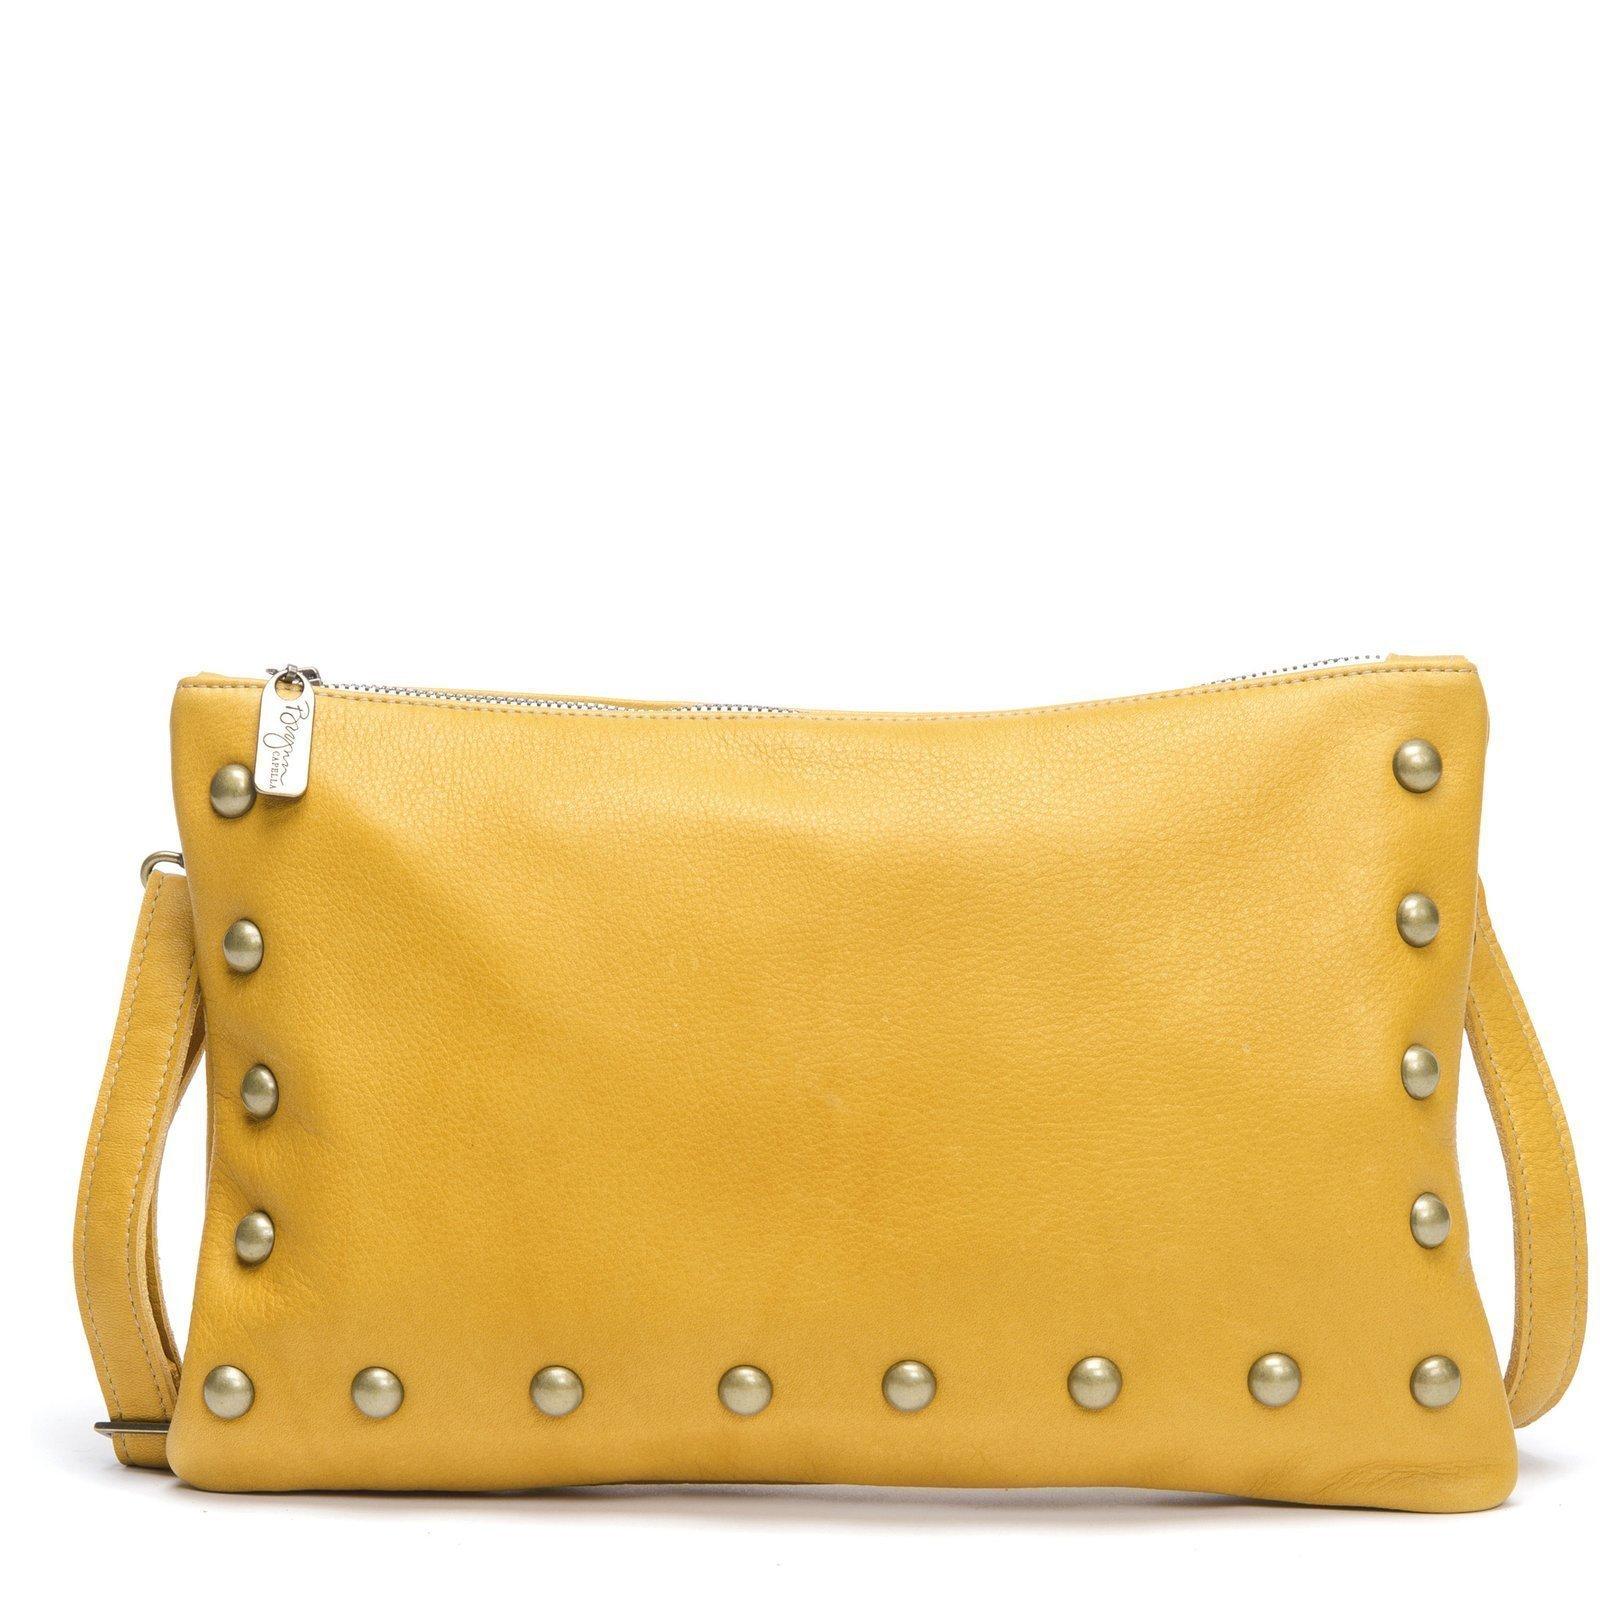 Mustard Yellow Italian Cowhide leather Crossbody Clutch